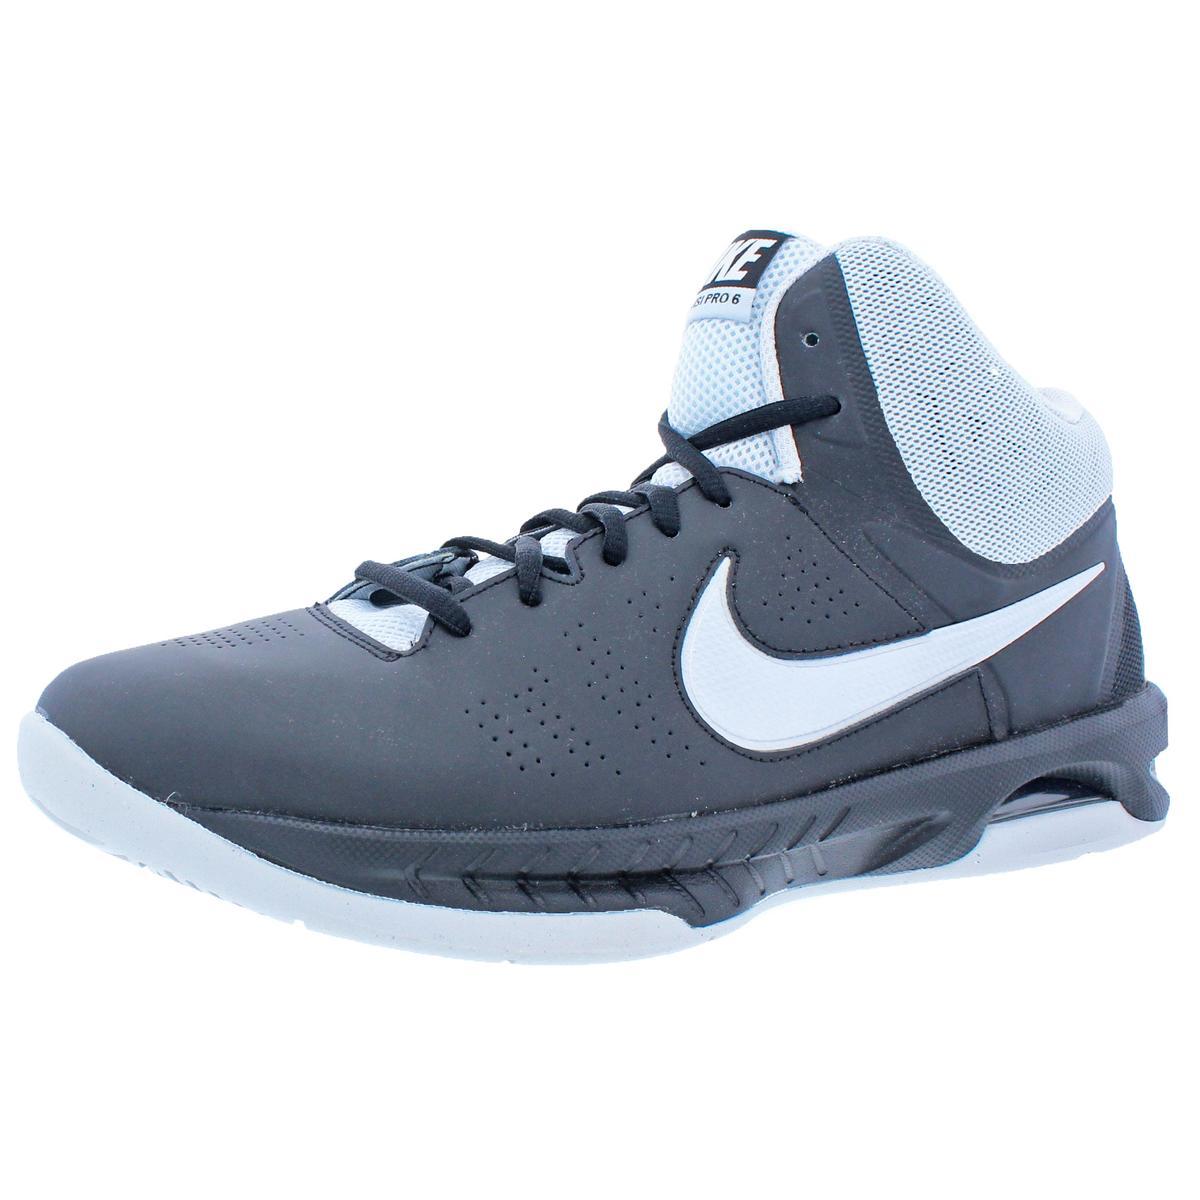 6e98c7e51c1 Details about Nike Womens Air Visi Pro VI Black Basketball Shoes 11.5  Medium (B